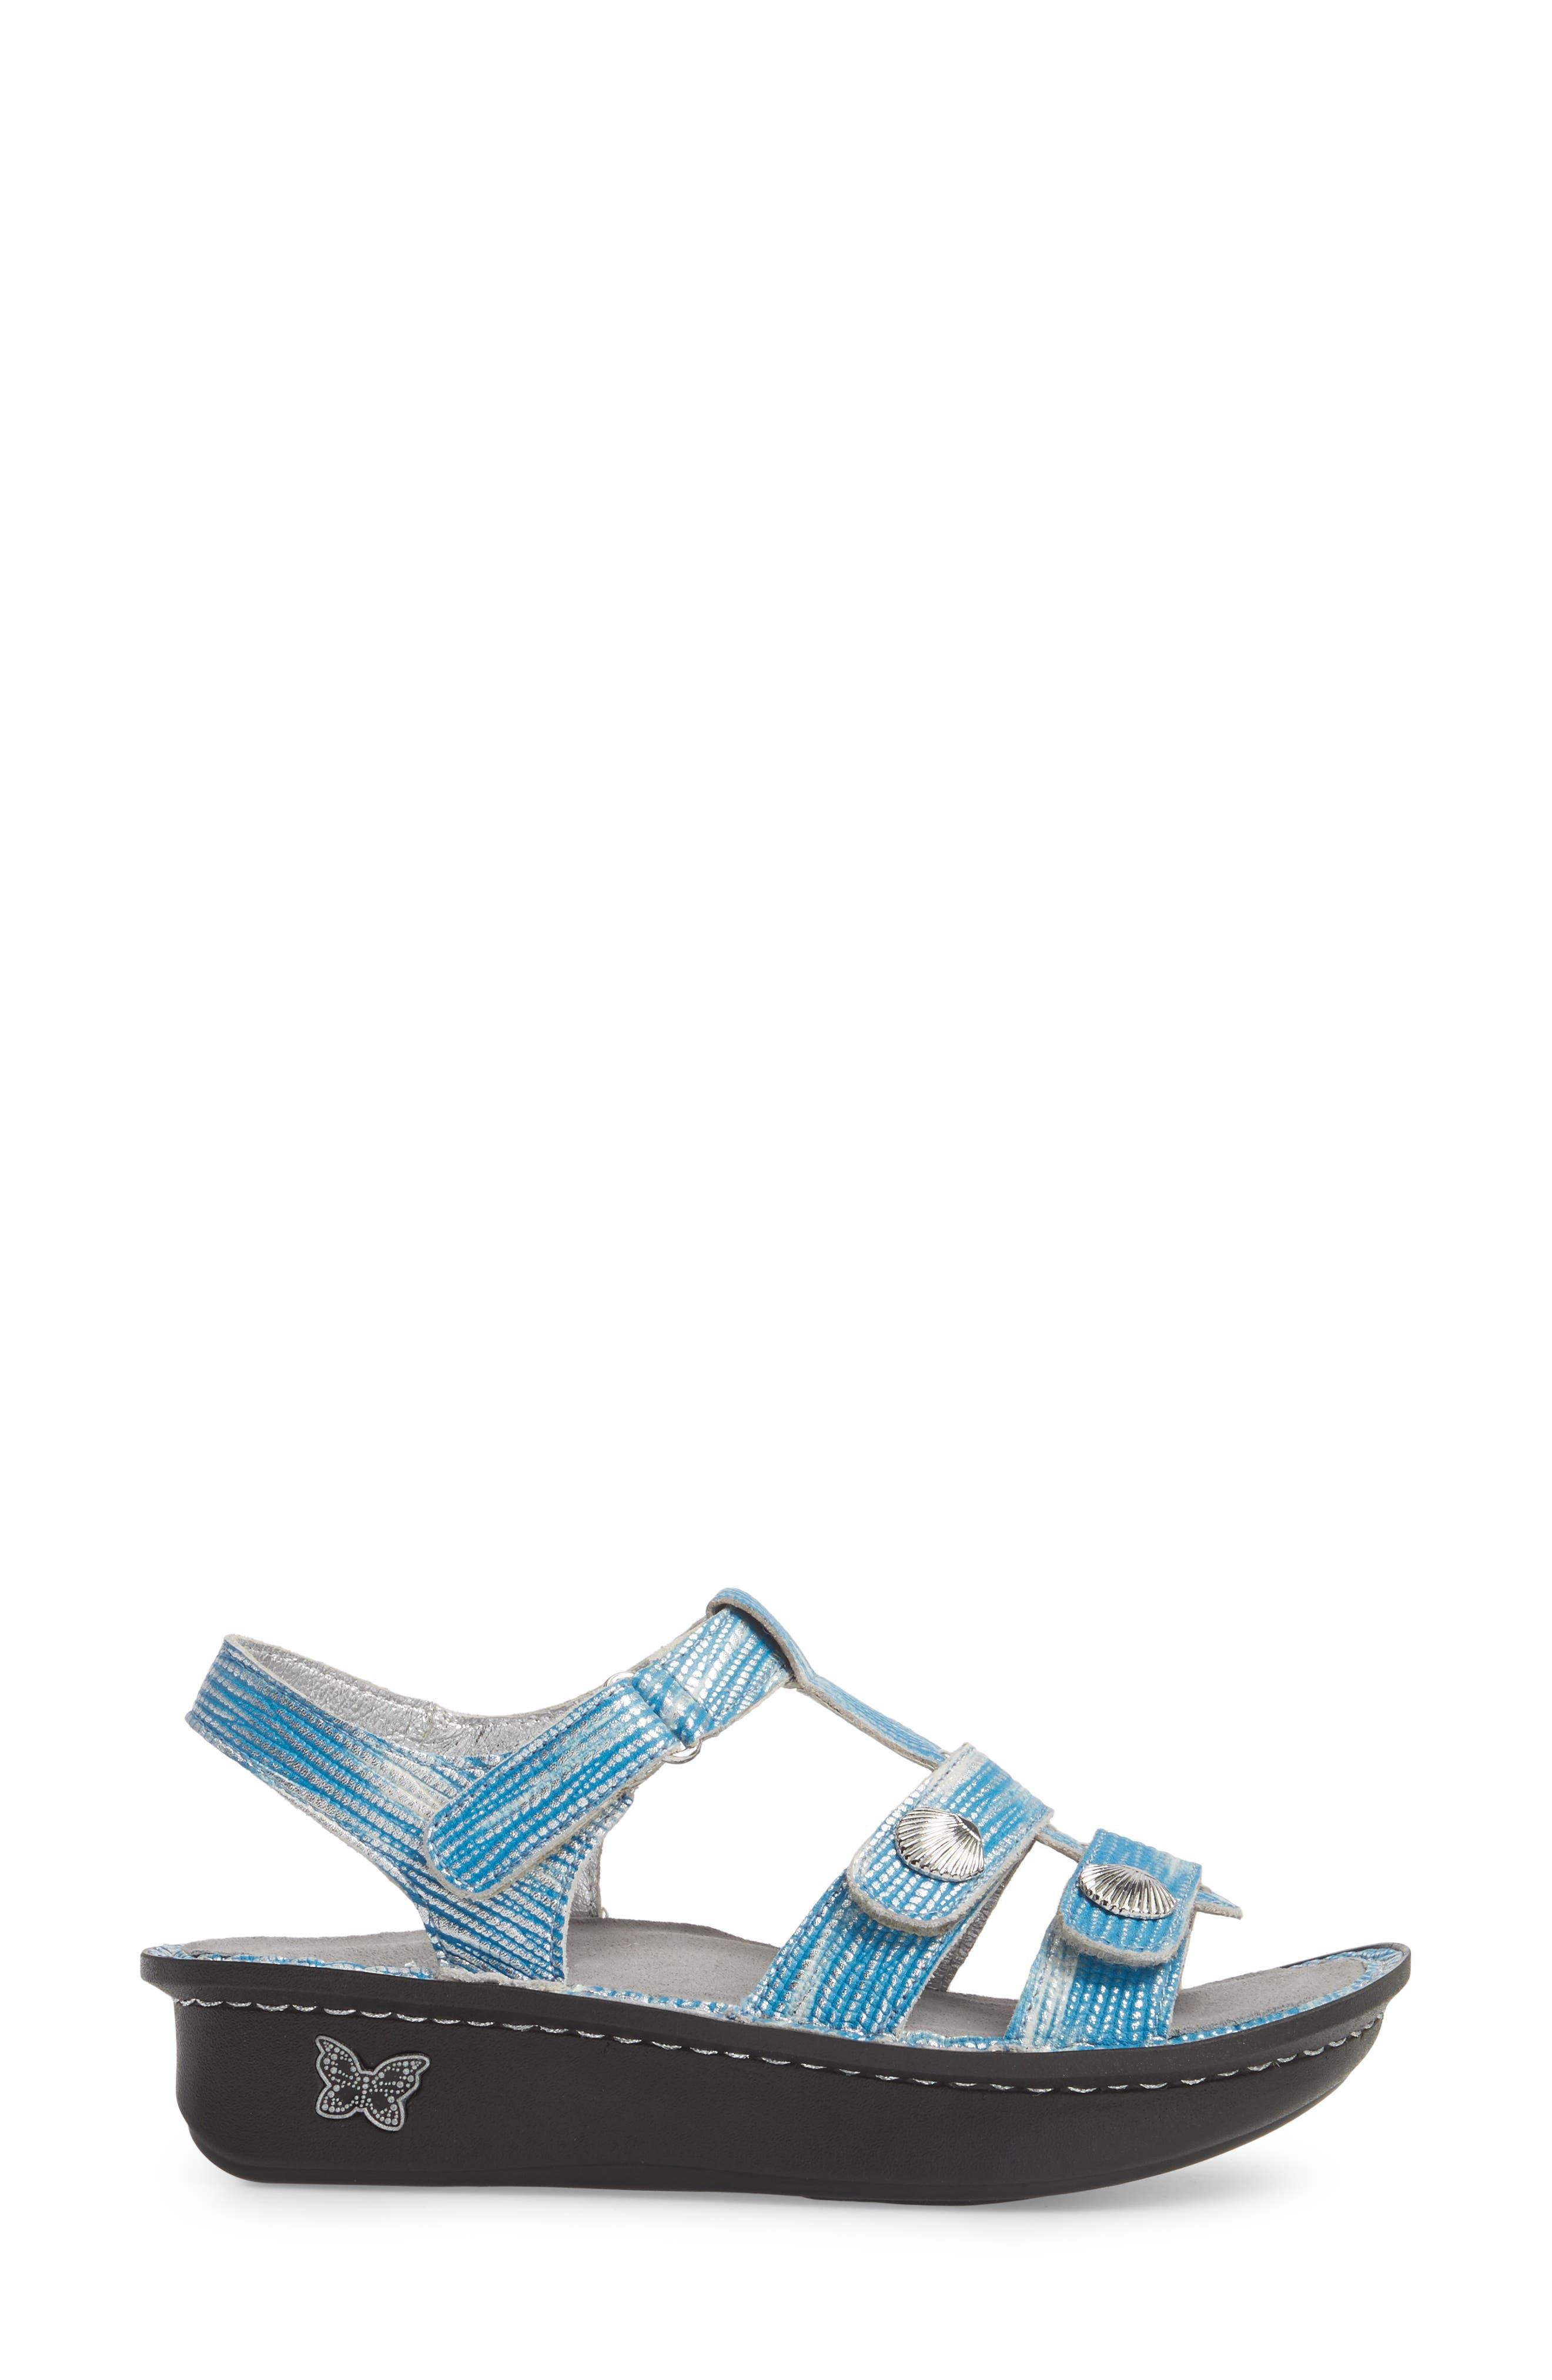 'Kleo' Sandal,                             Alternate thumbnail 3, color,                             Wrapture Blues Leather